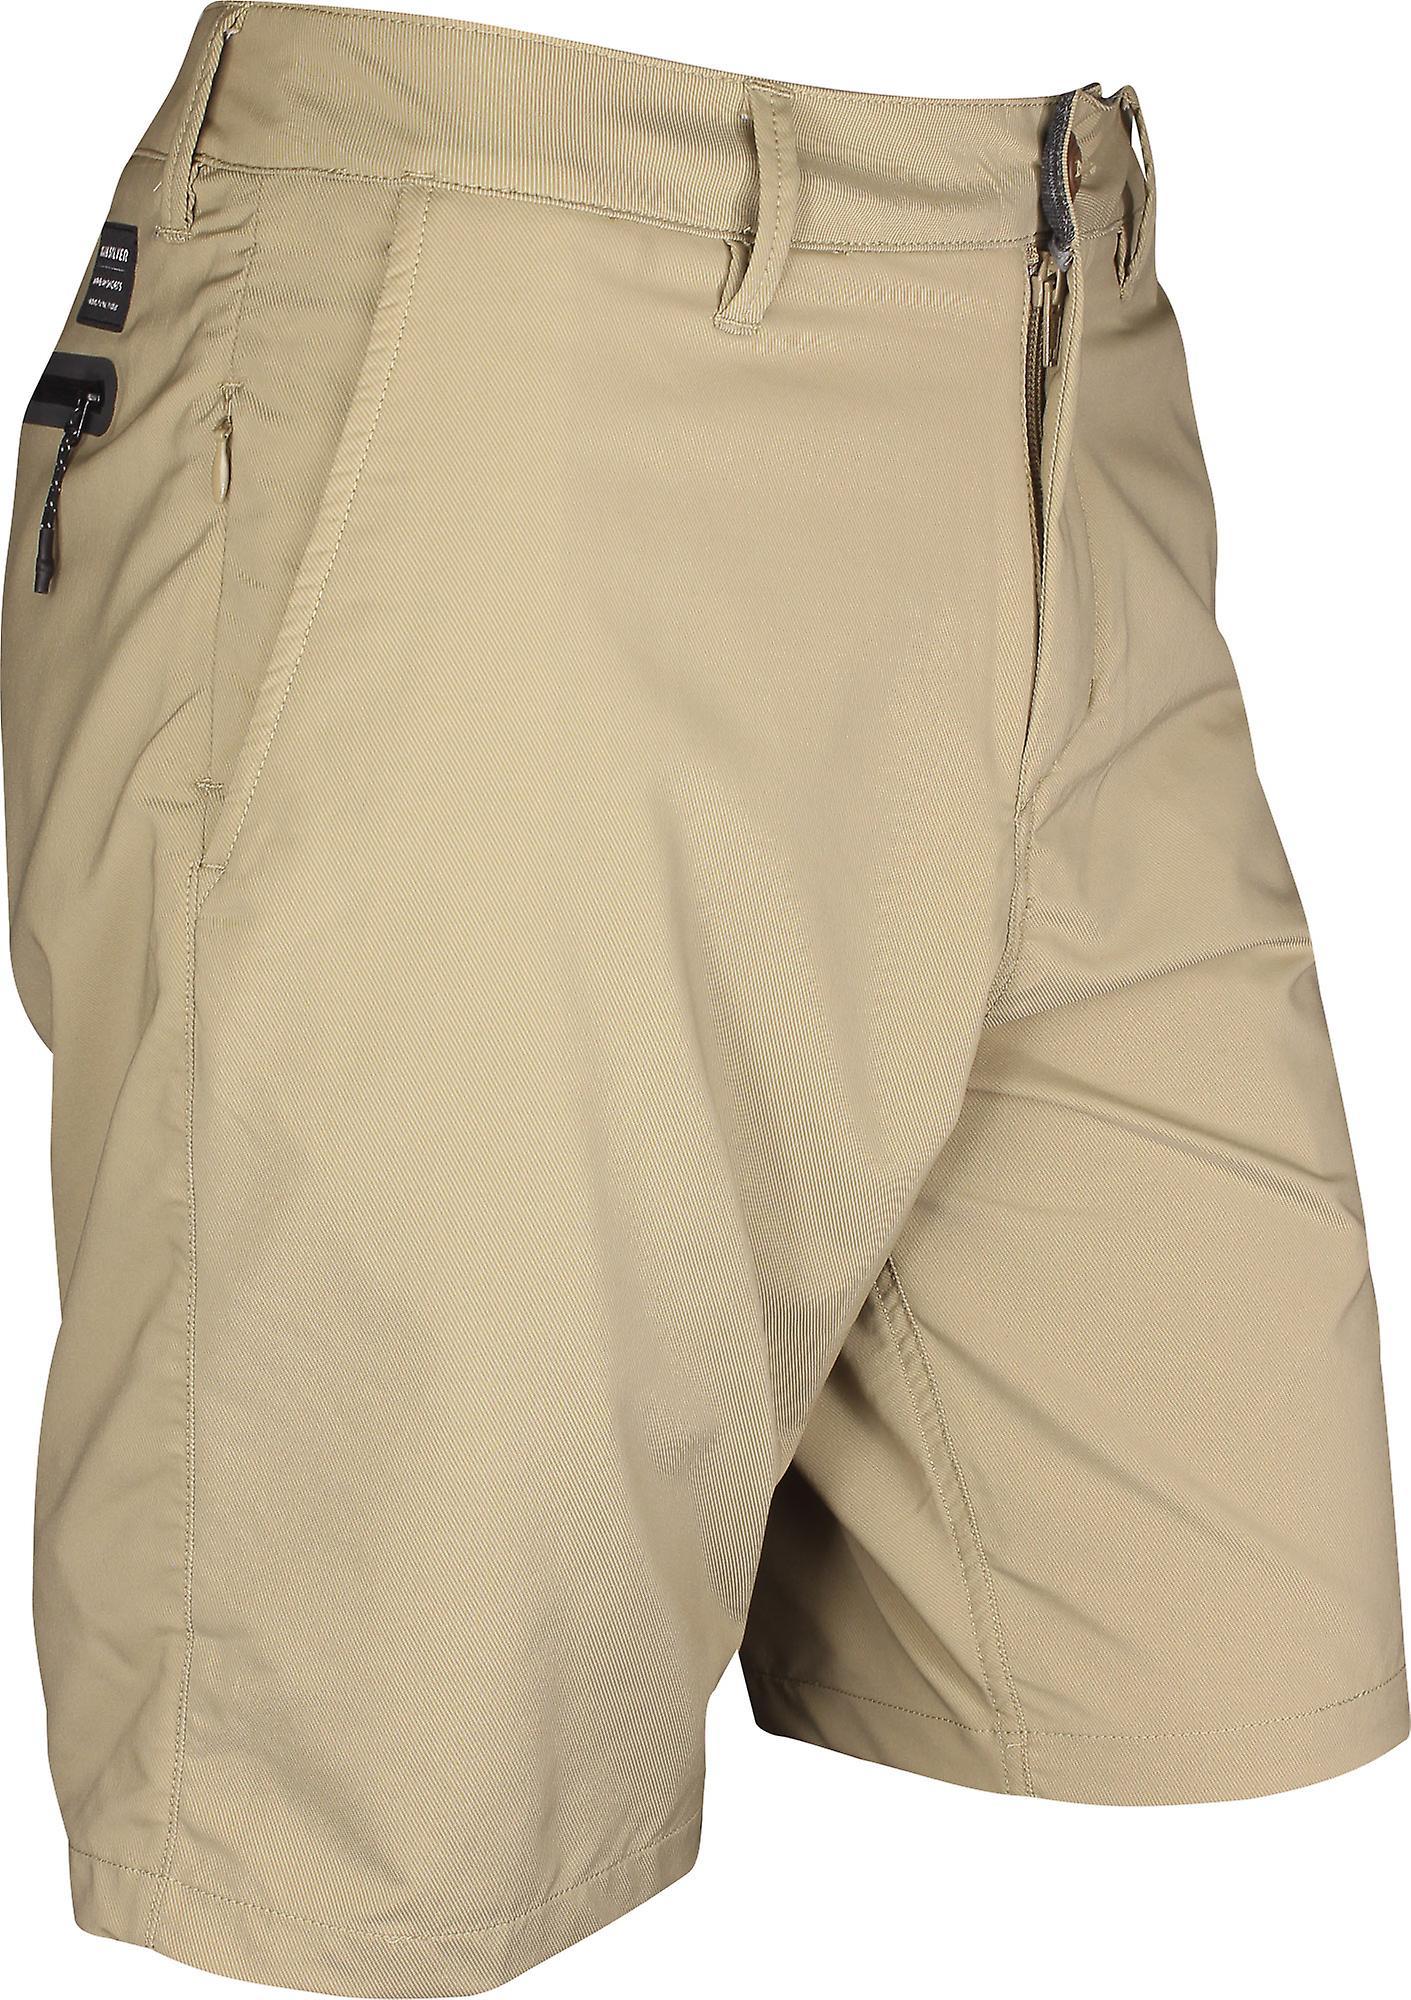 Quiksilver Mens transitt Twill Amphibian 20-Shorts - Elmwood Brown